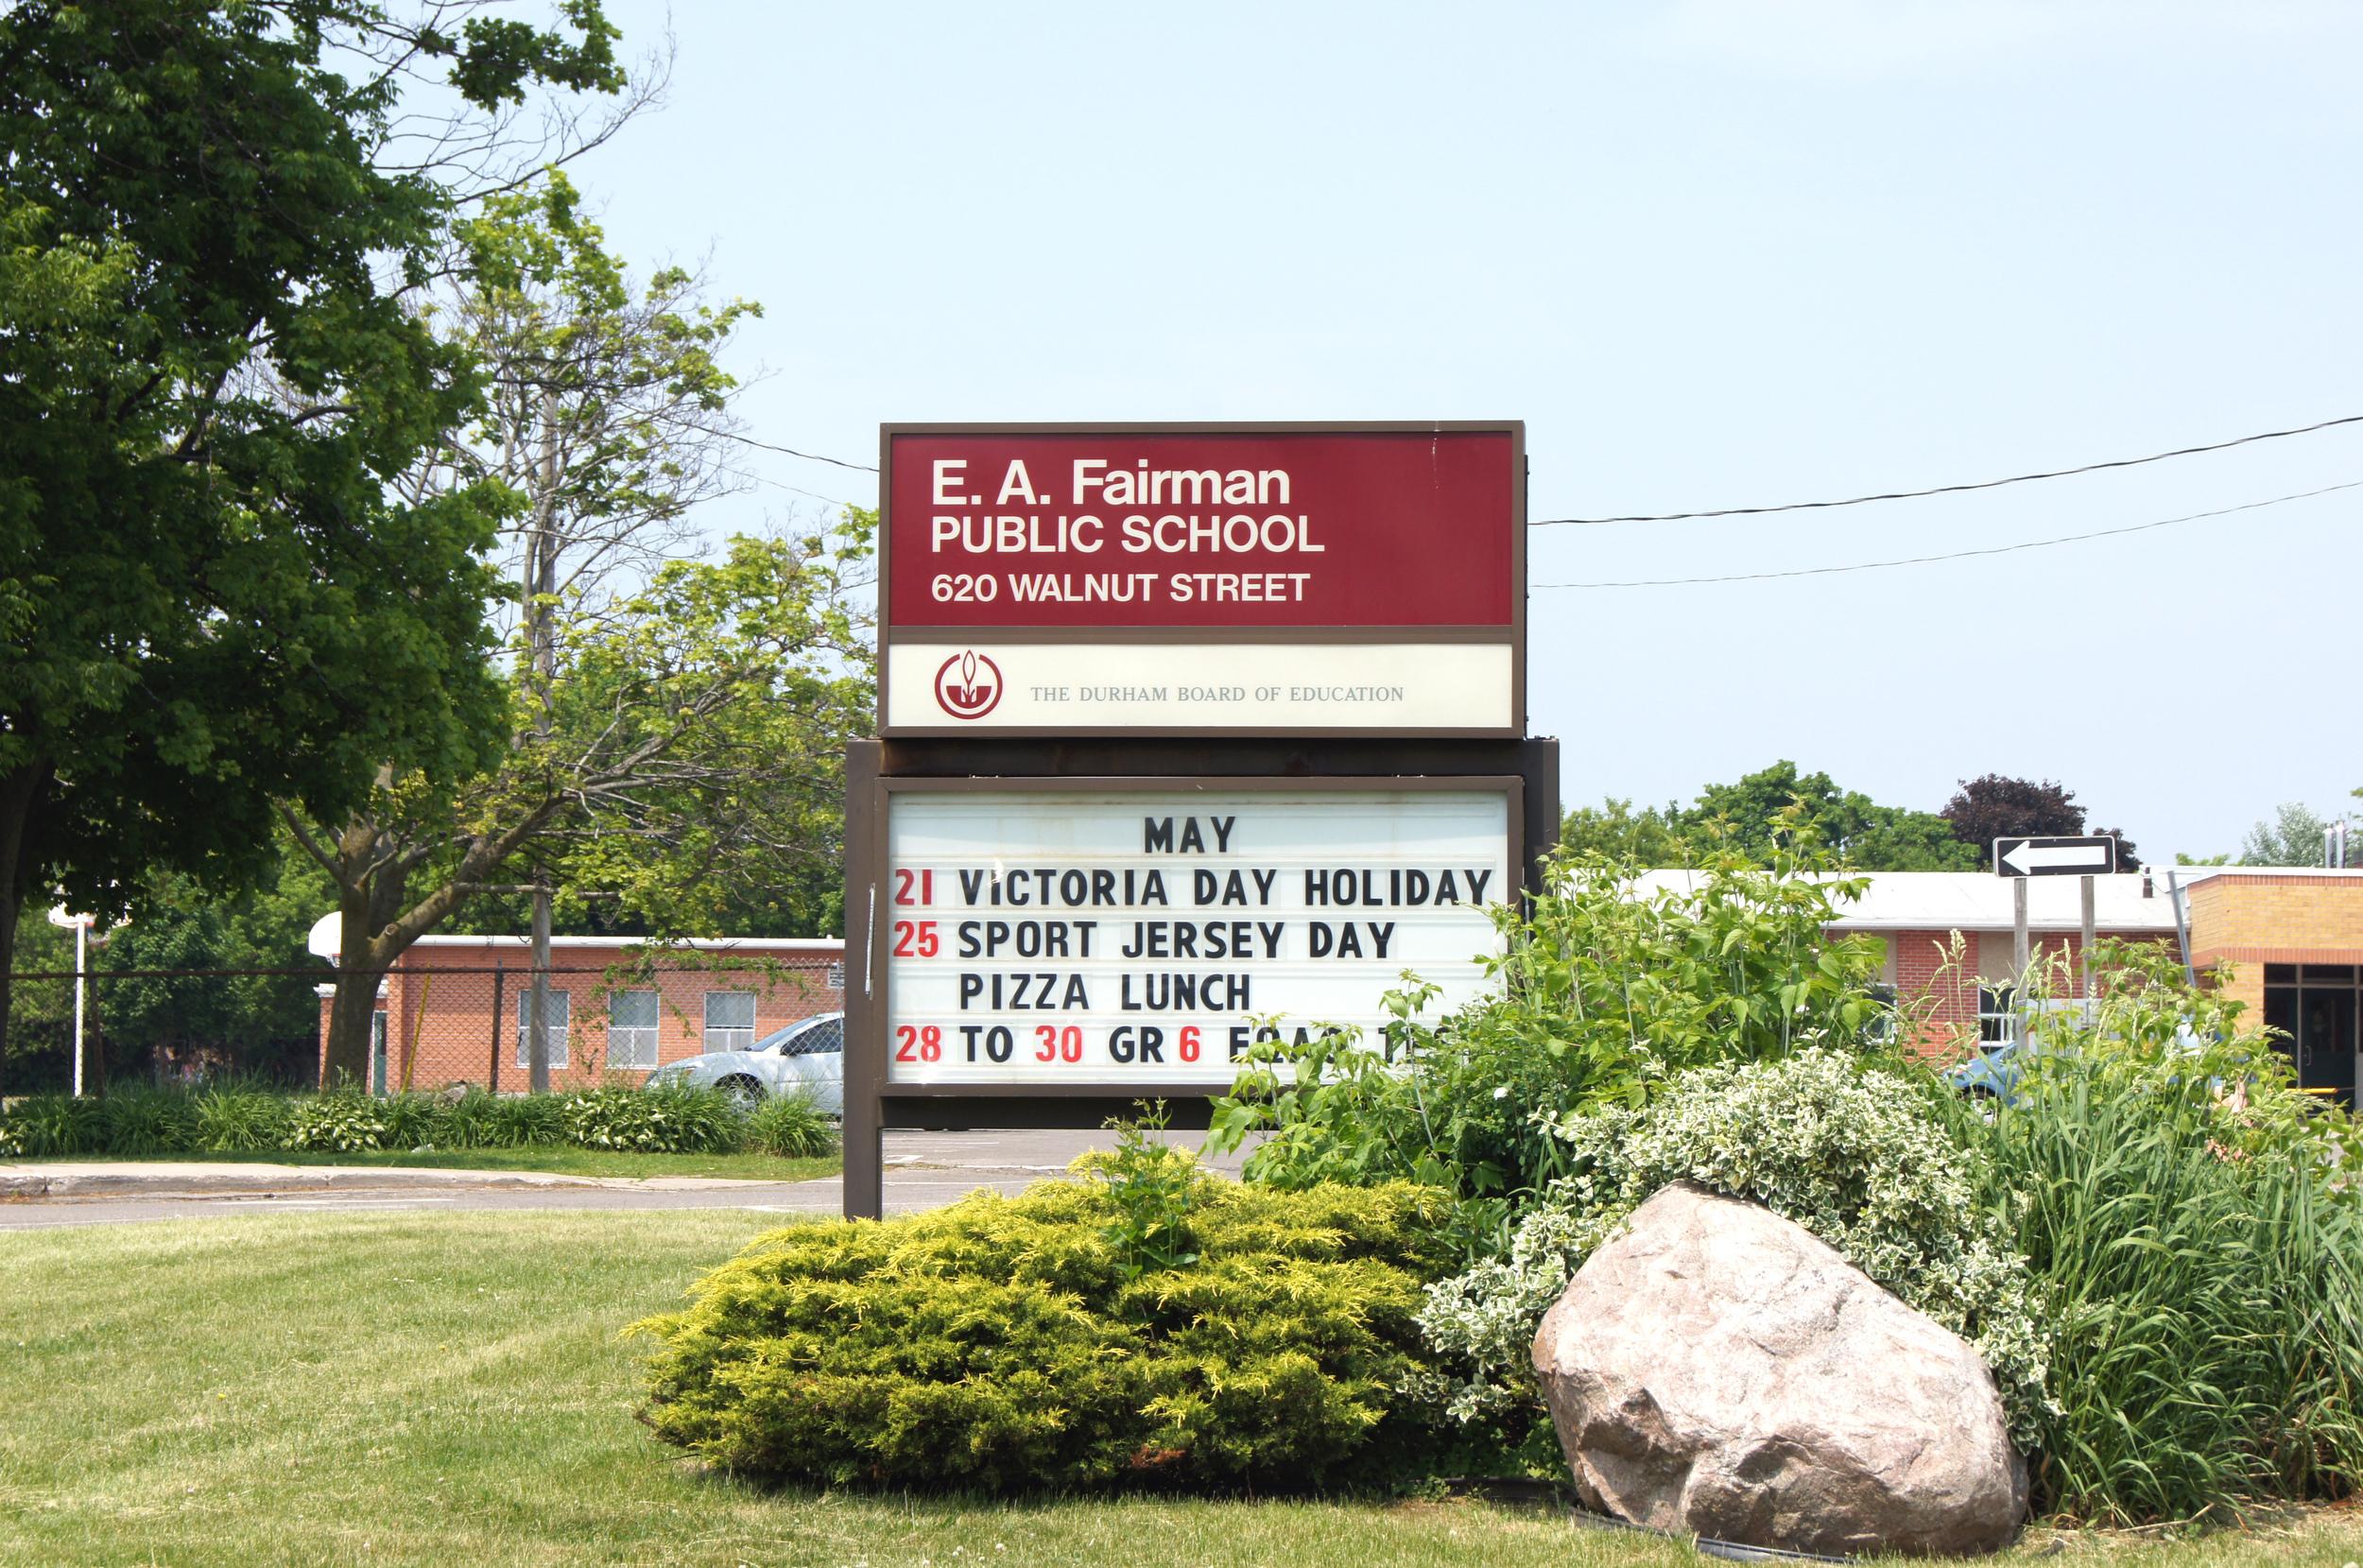 E.A. Fairman Public School.JPG